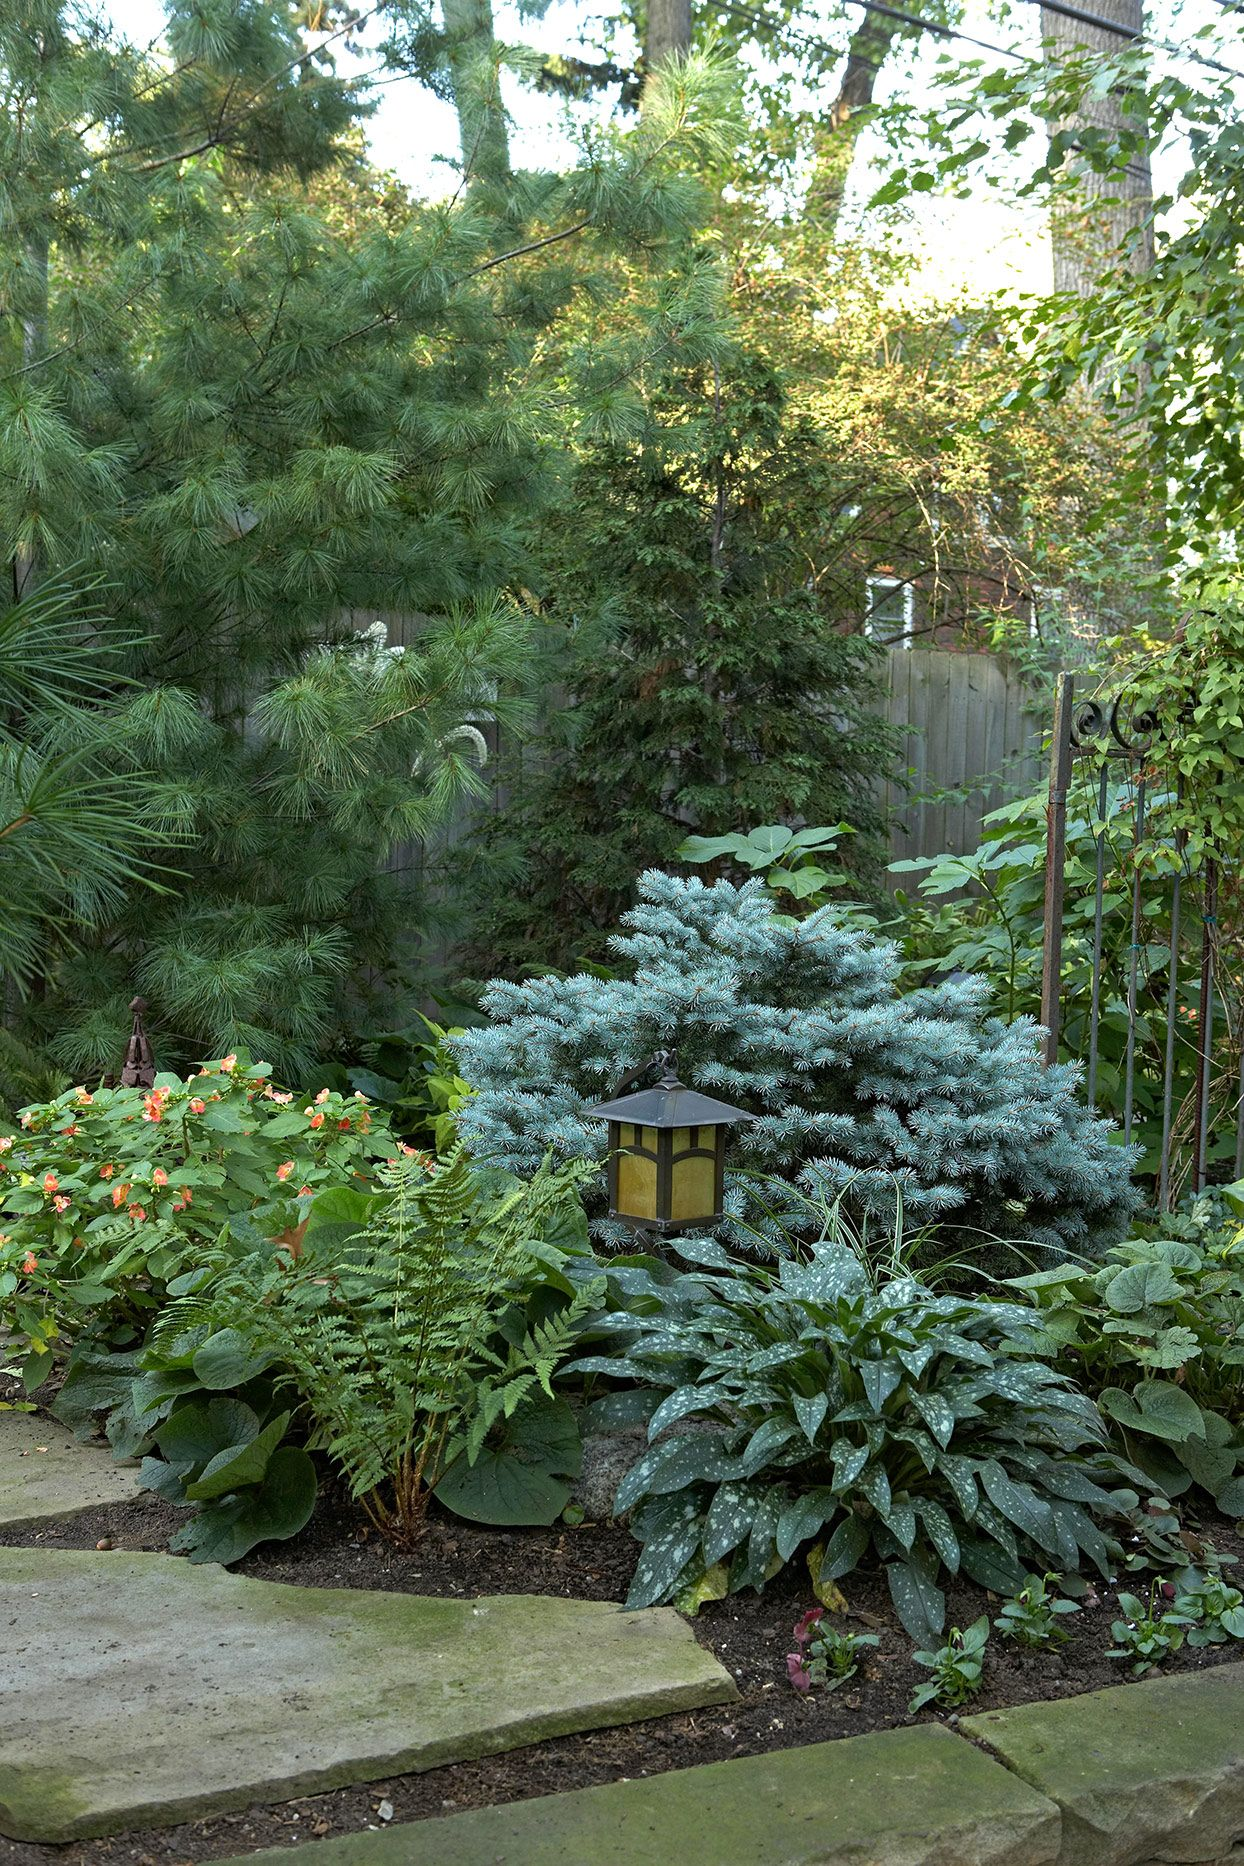 Easy, Eye-Catching Ways to Transform Your Front Yard Landscaping #modernfrontyard